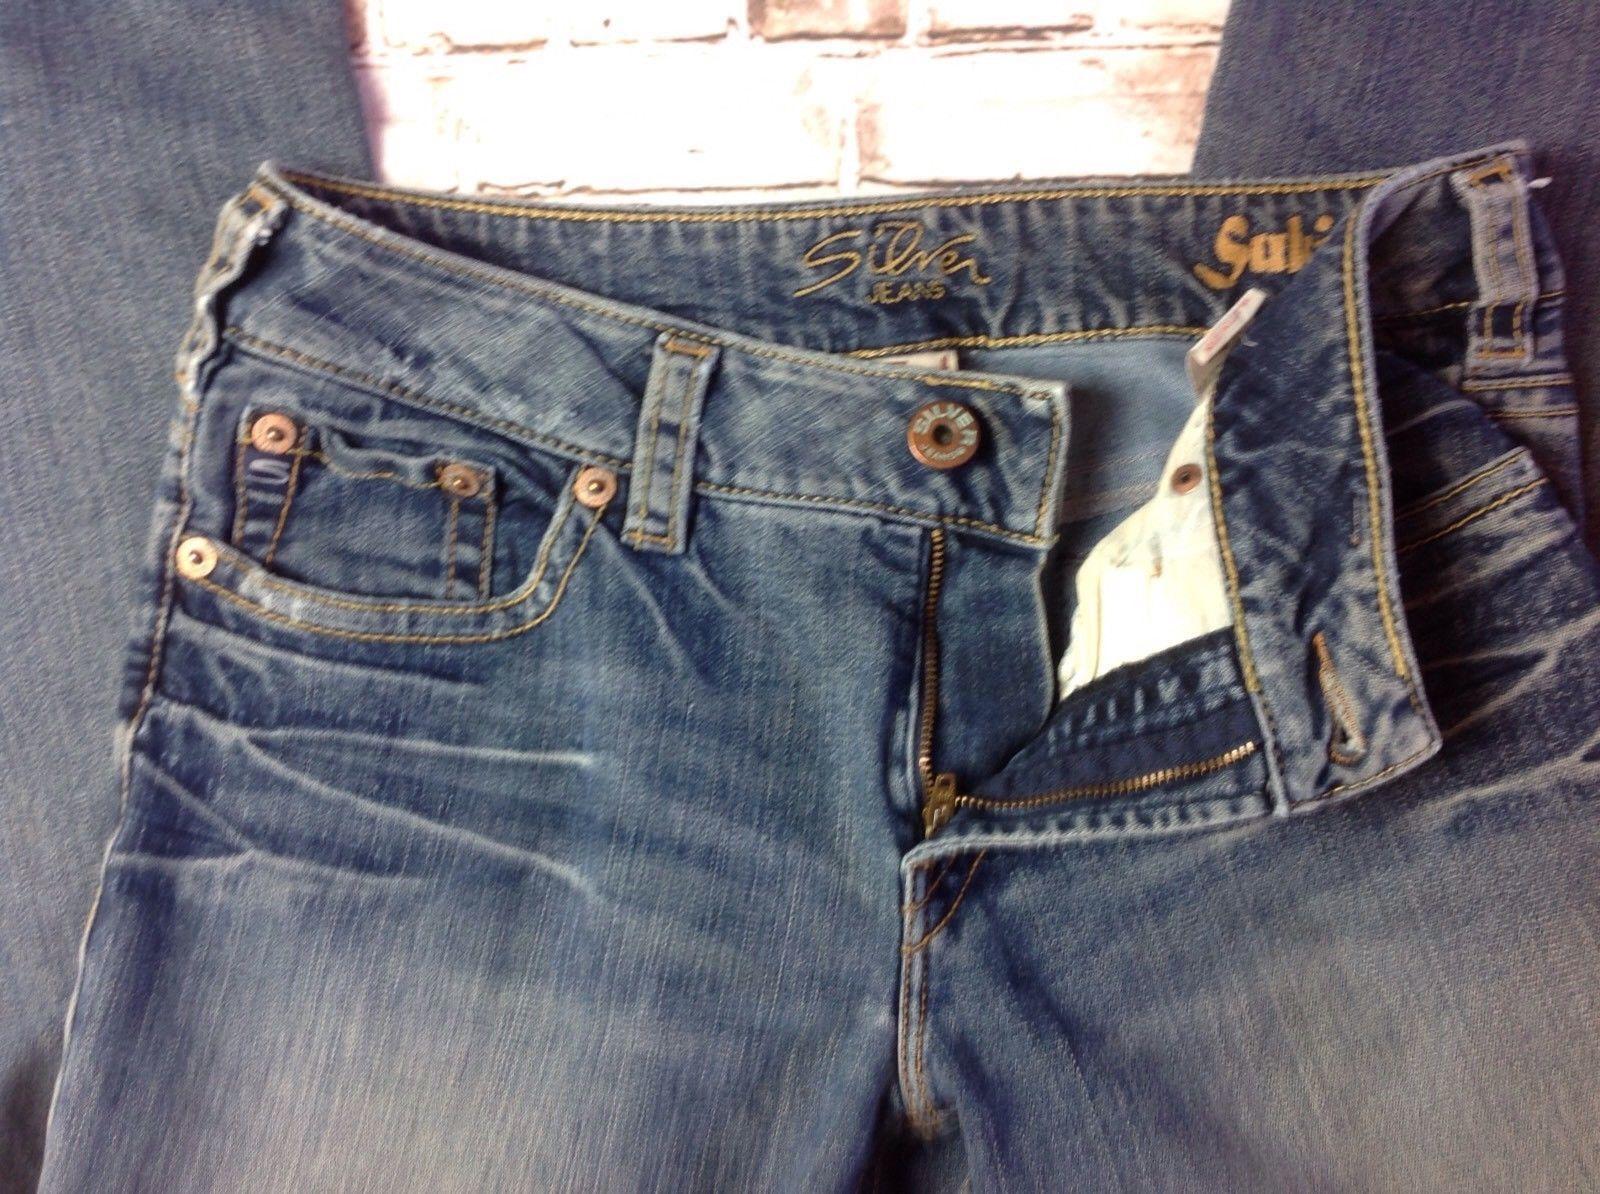 Buckle SILVER AIKO Faux Flap Skinny Low Rise Stretch Dark Blue Jeans Sz 28 x 31